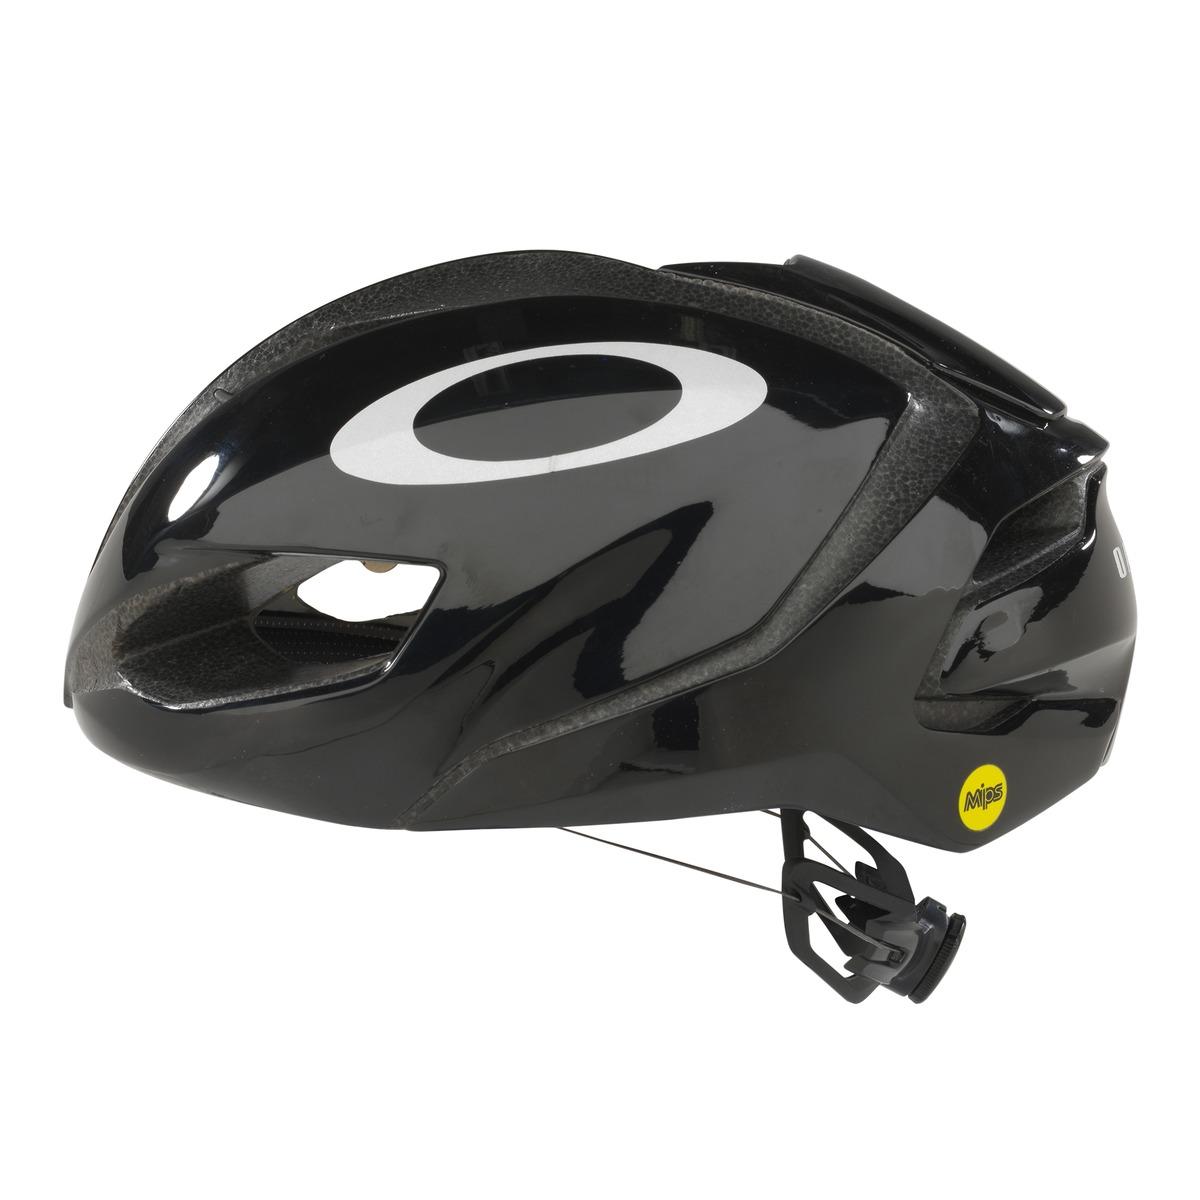 oakley fahrradhelm